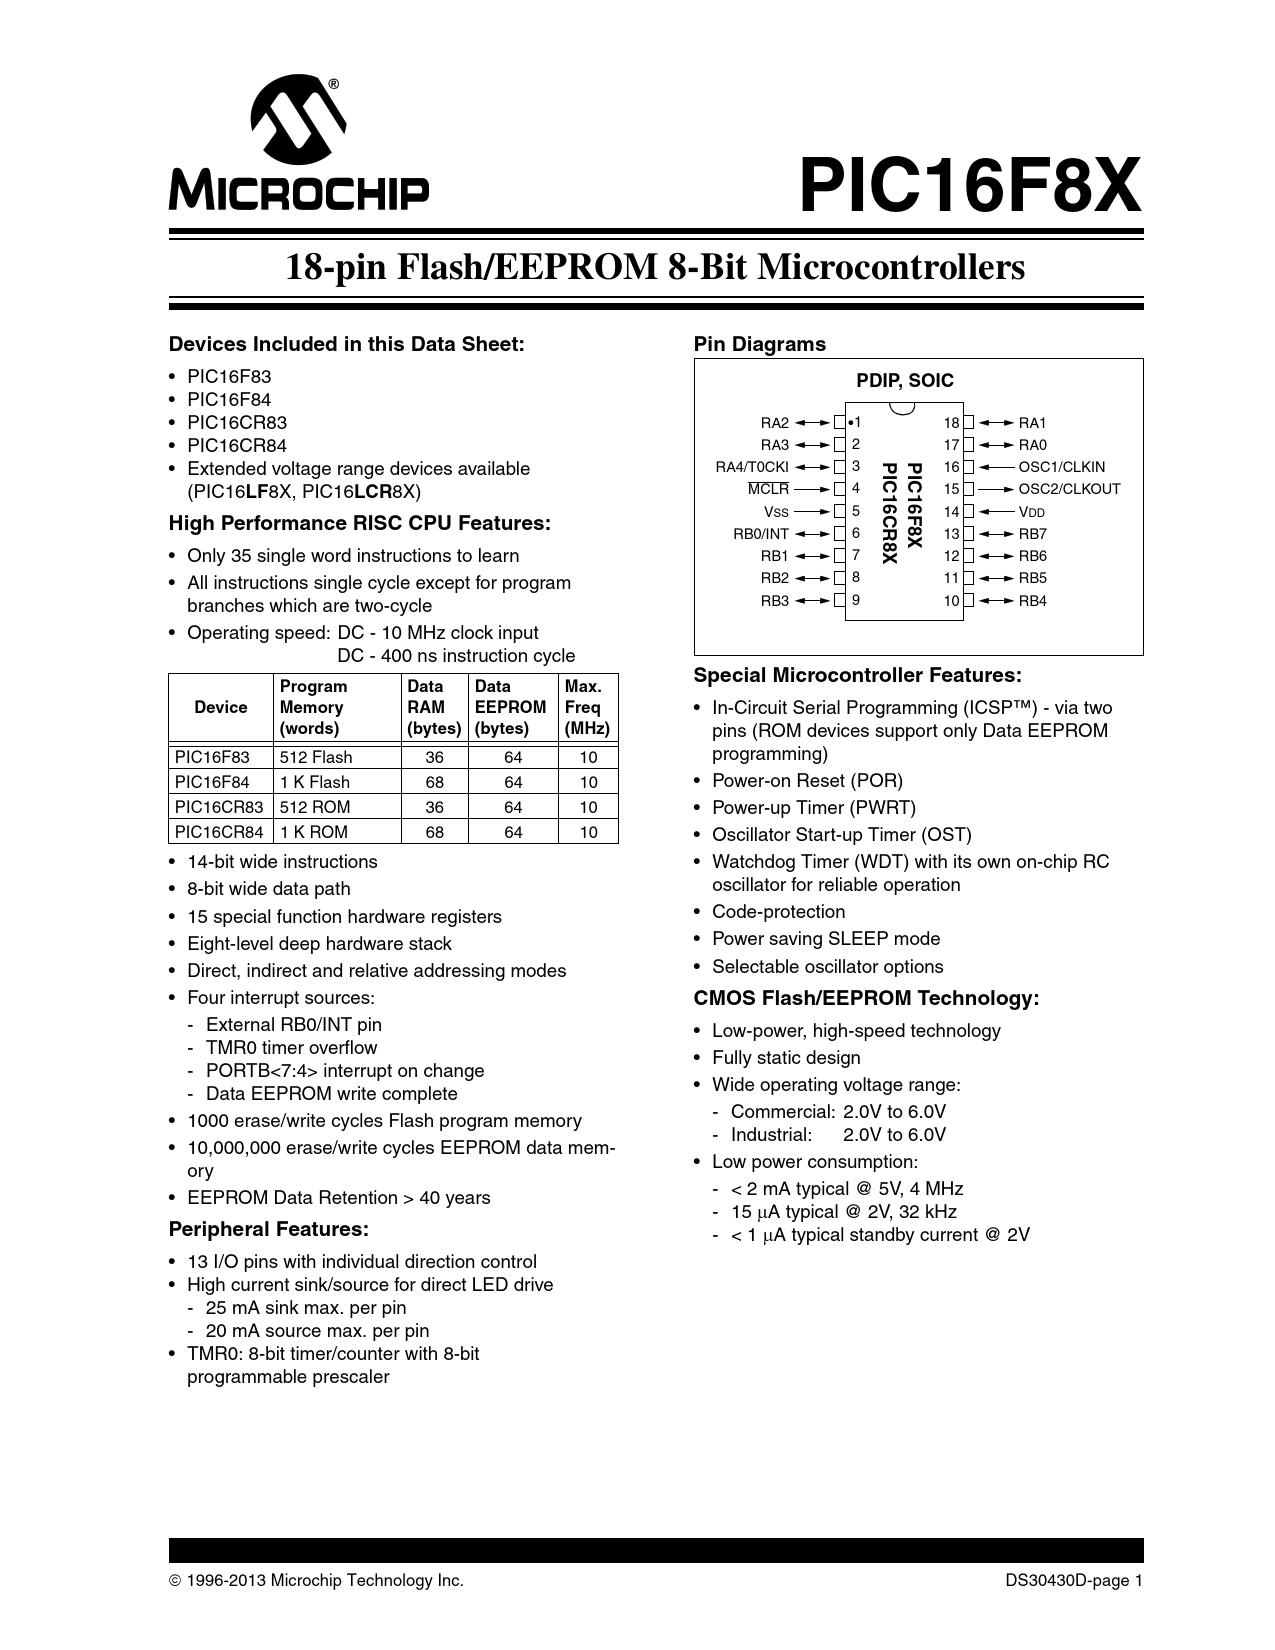 Datasheet PIC16F8X: PIC16F83, PIC16F84, PIC16CR83, PIC16CR84 Microchip